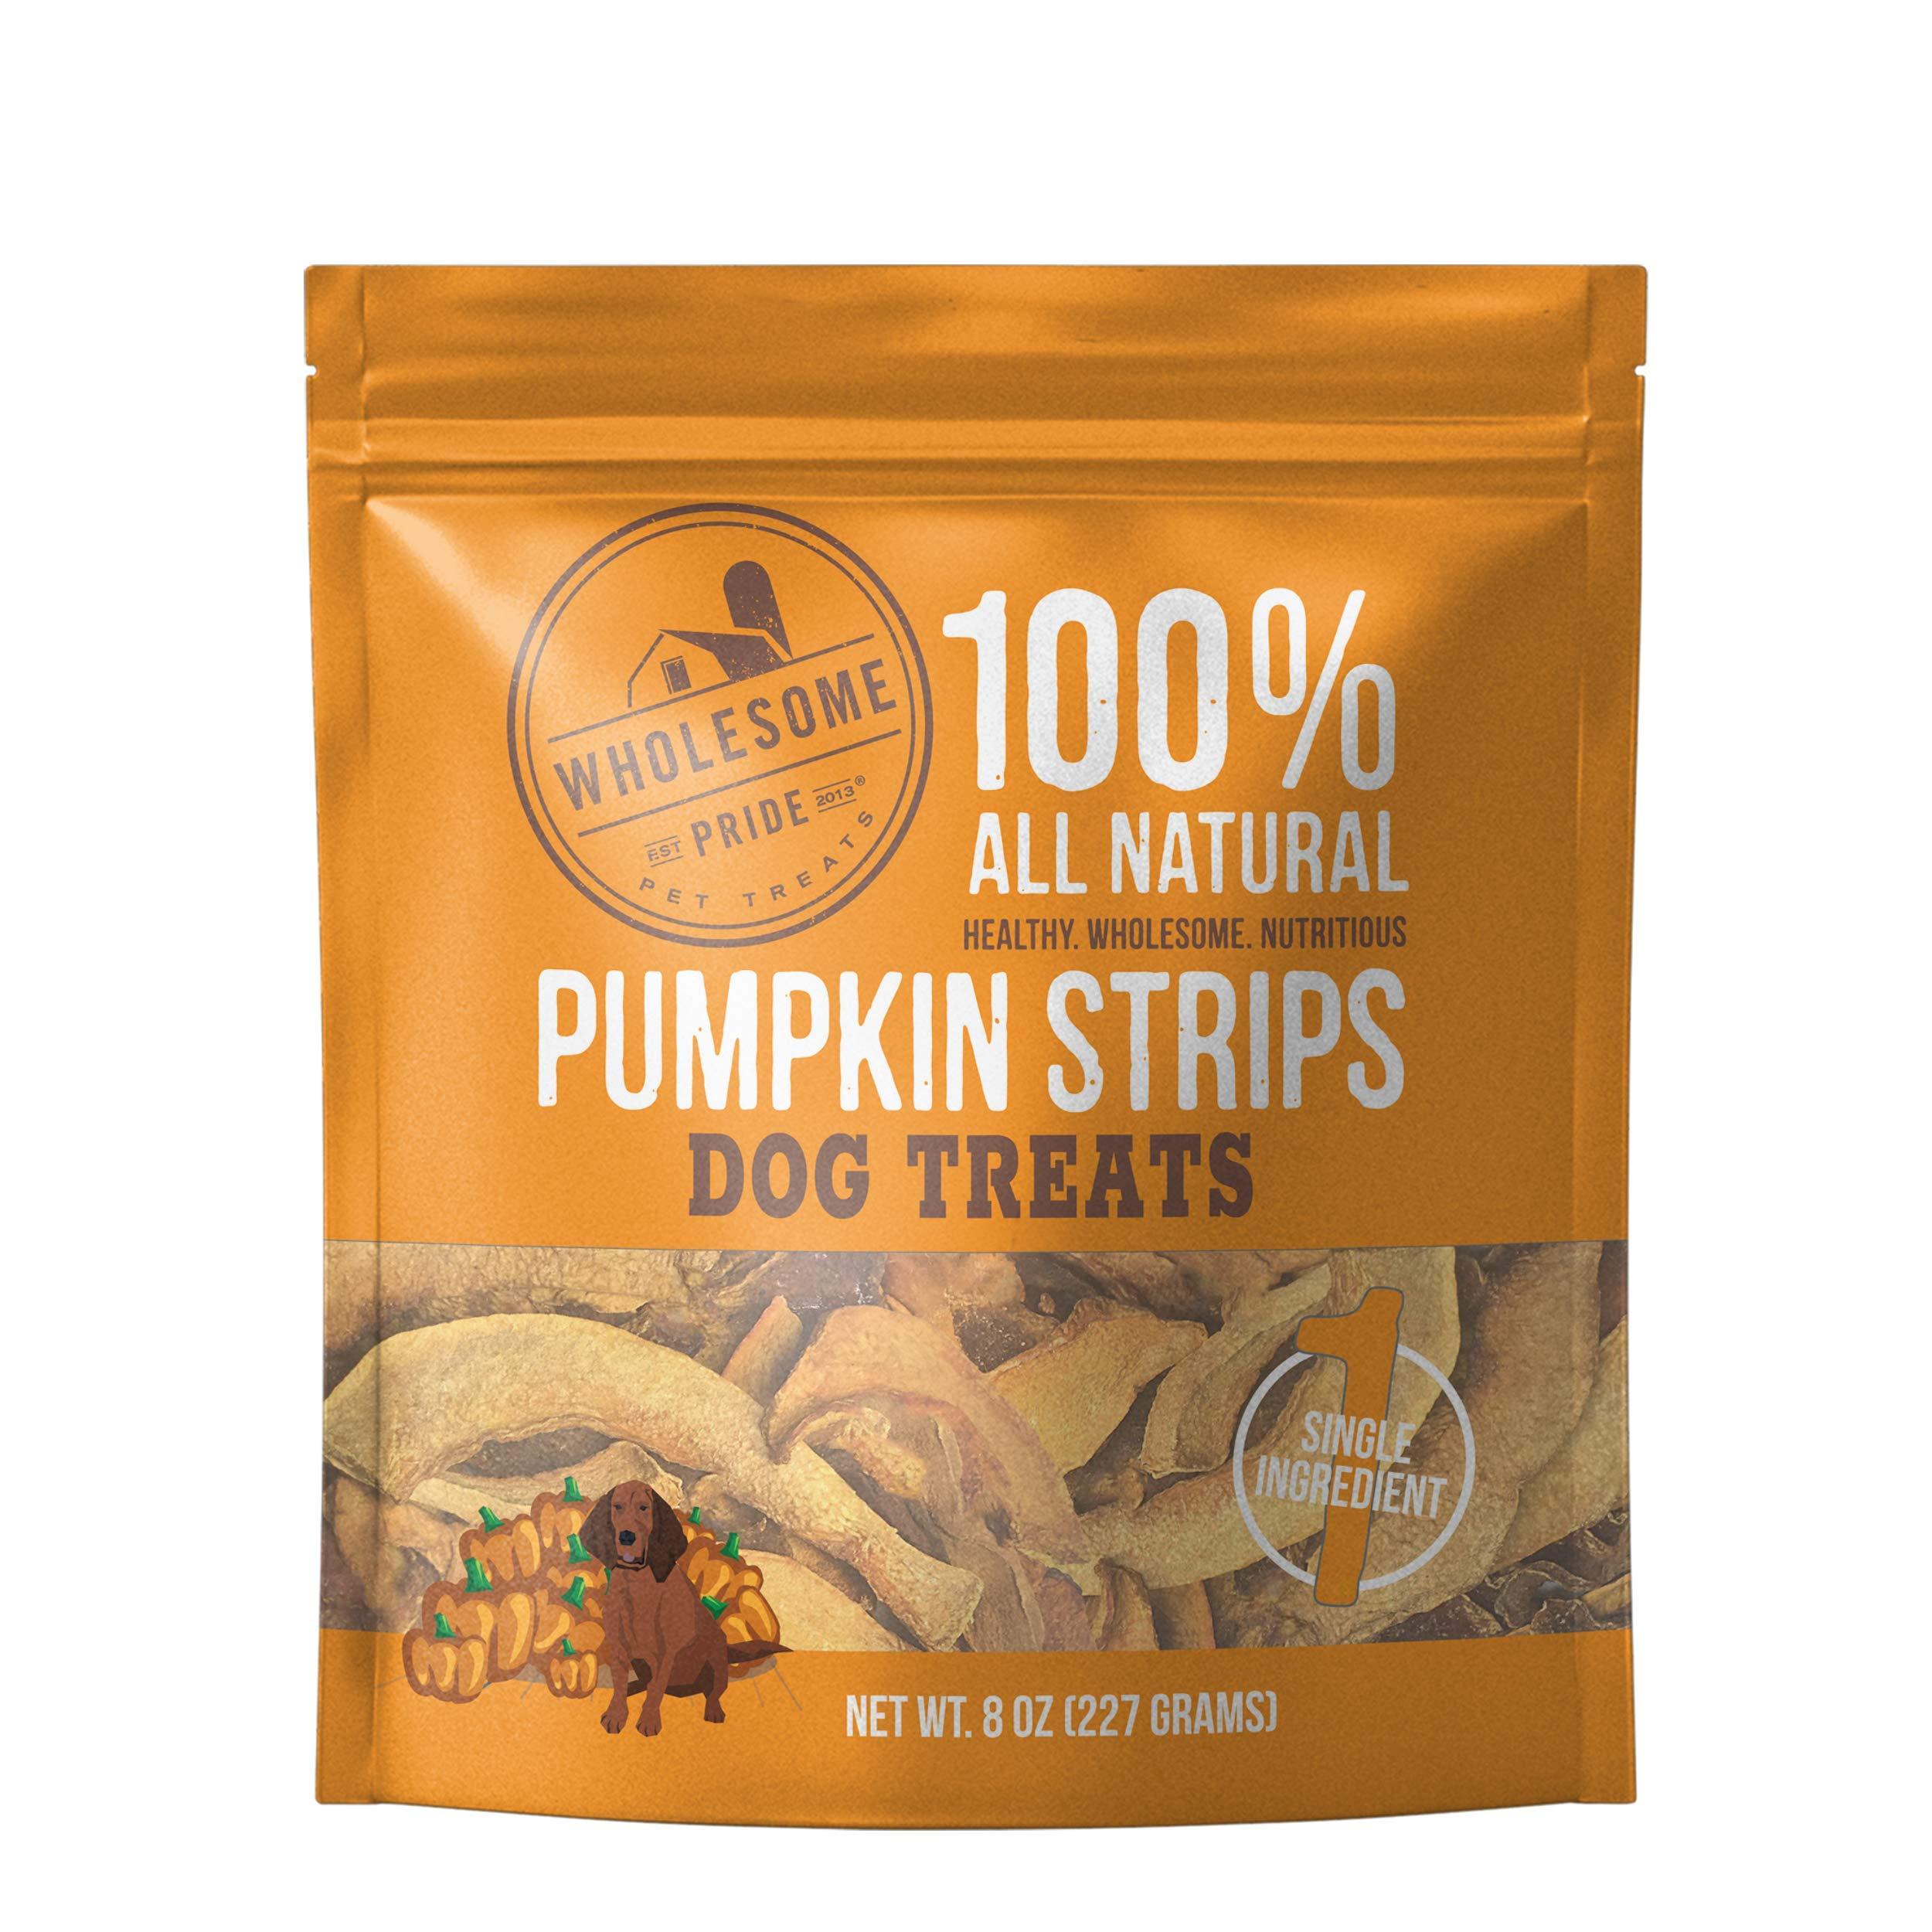 Wholesome Pride Pumpkin Strips, 8 oz - All Natural Healthy Dog Treats - Vegan, Gluten and Grain-Free Dog Snacks